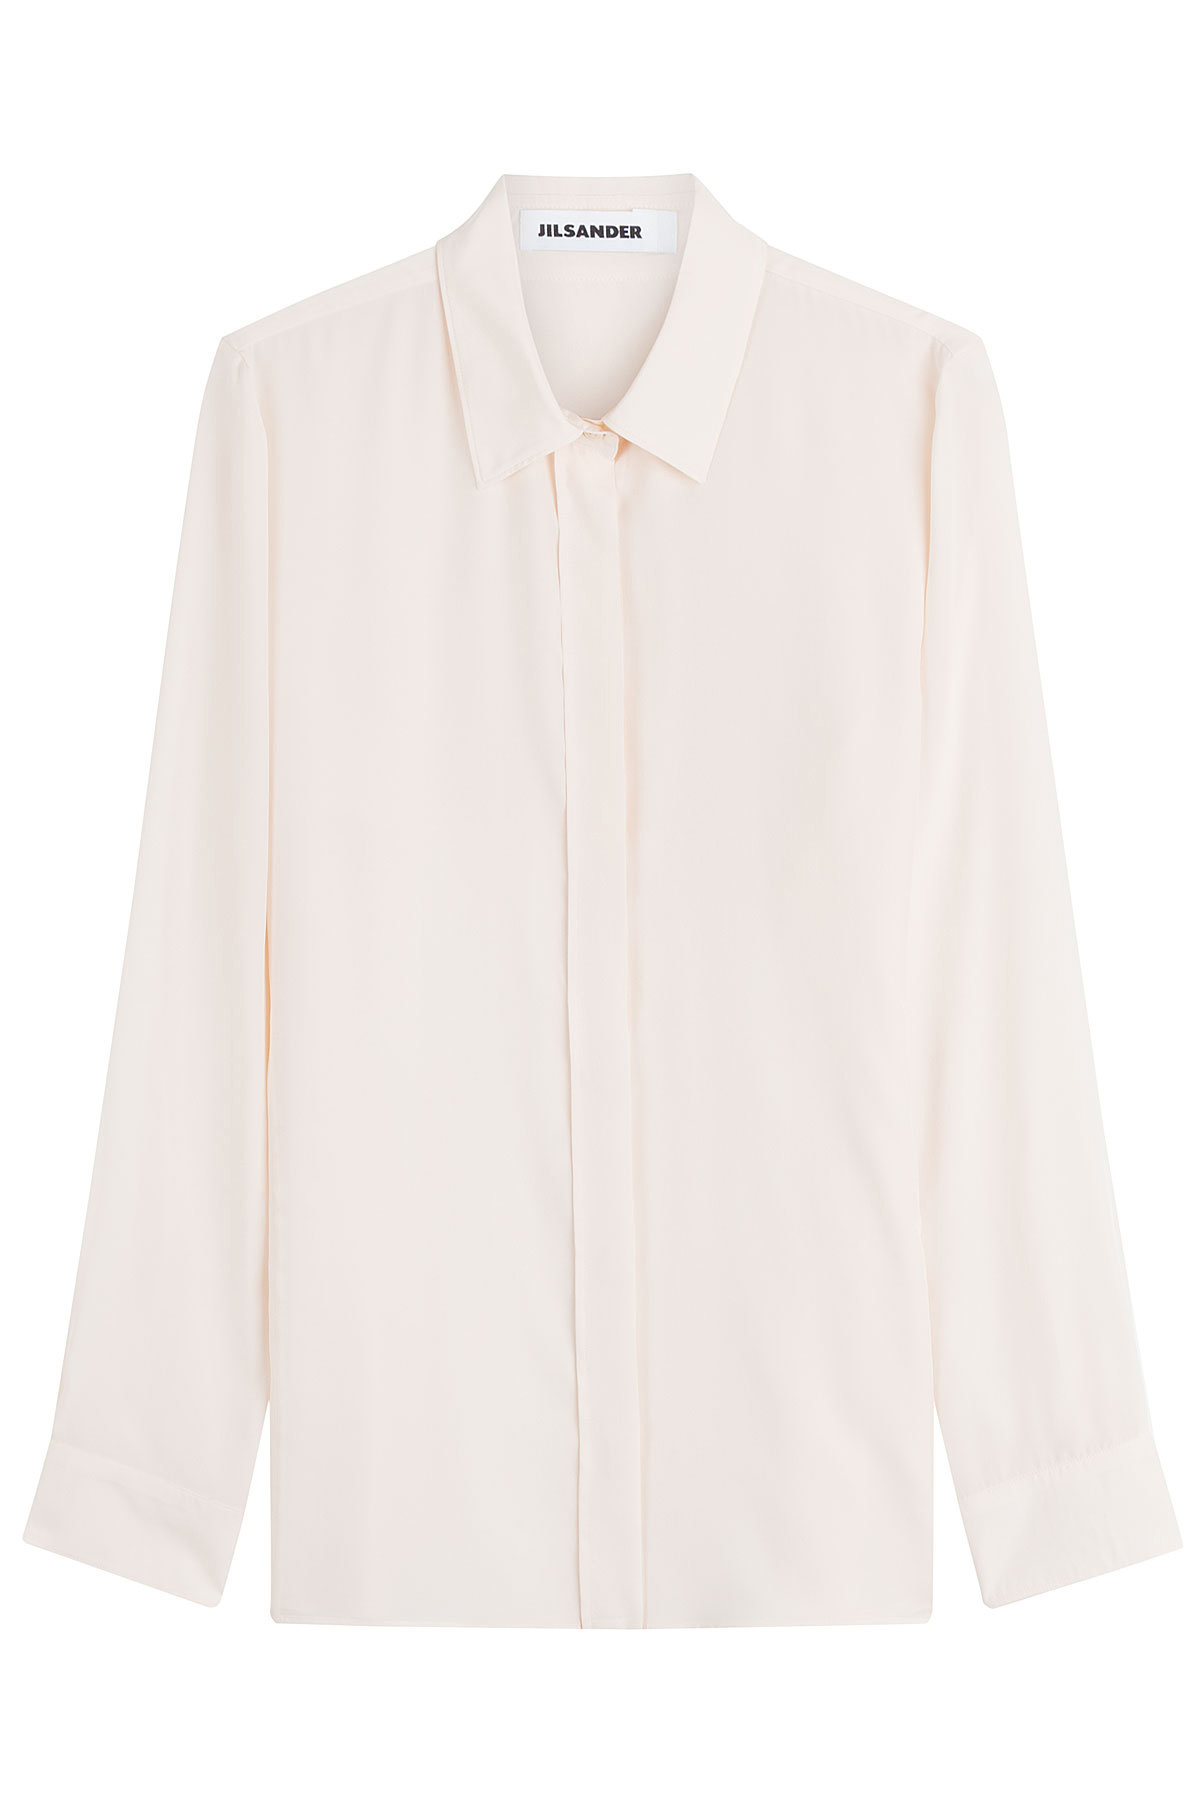 437dac25085b9f ... Marc Jacobs faux leather skirt Guiseppe Zanotti platform sandals. Jil  Sander ivory white silk blouse